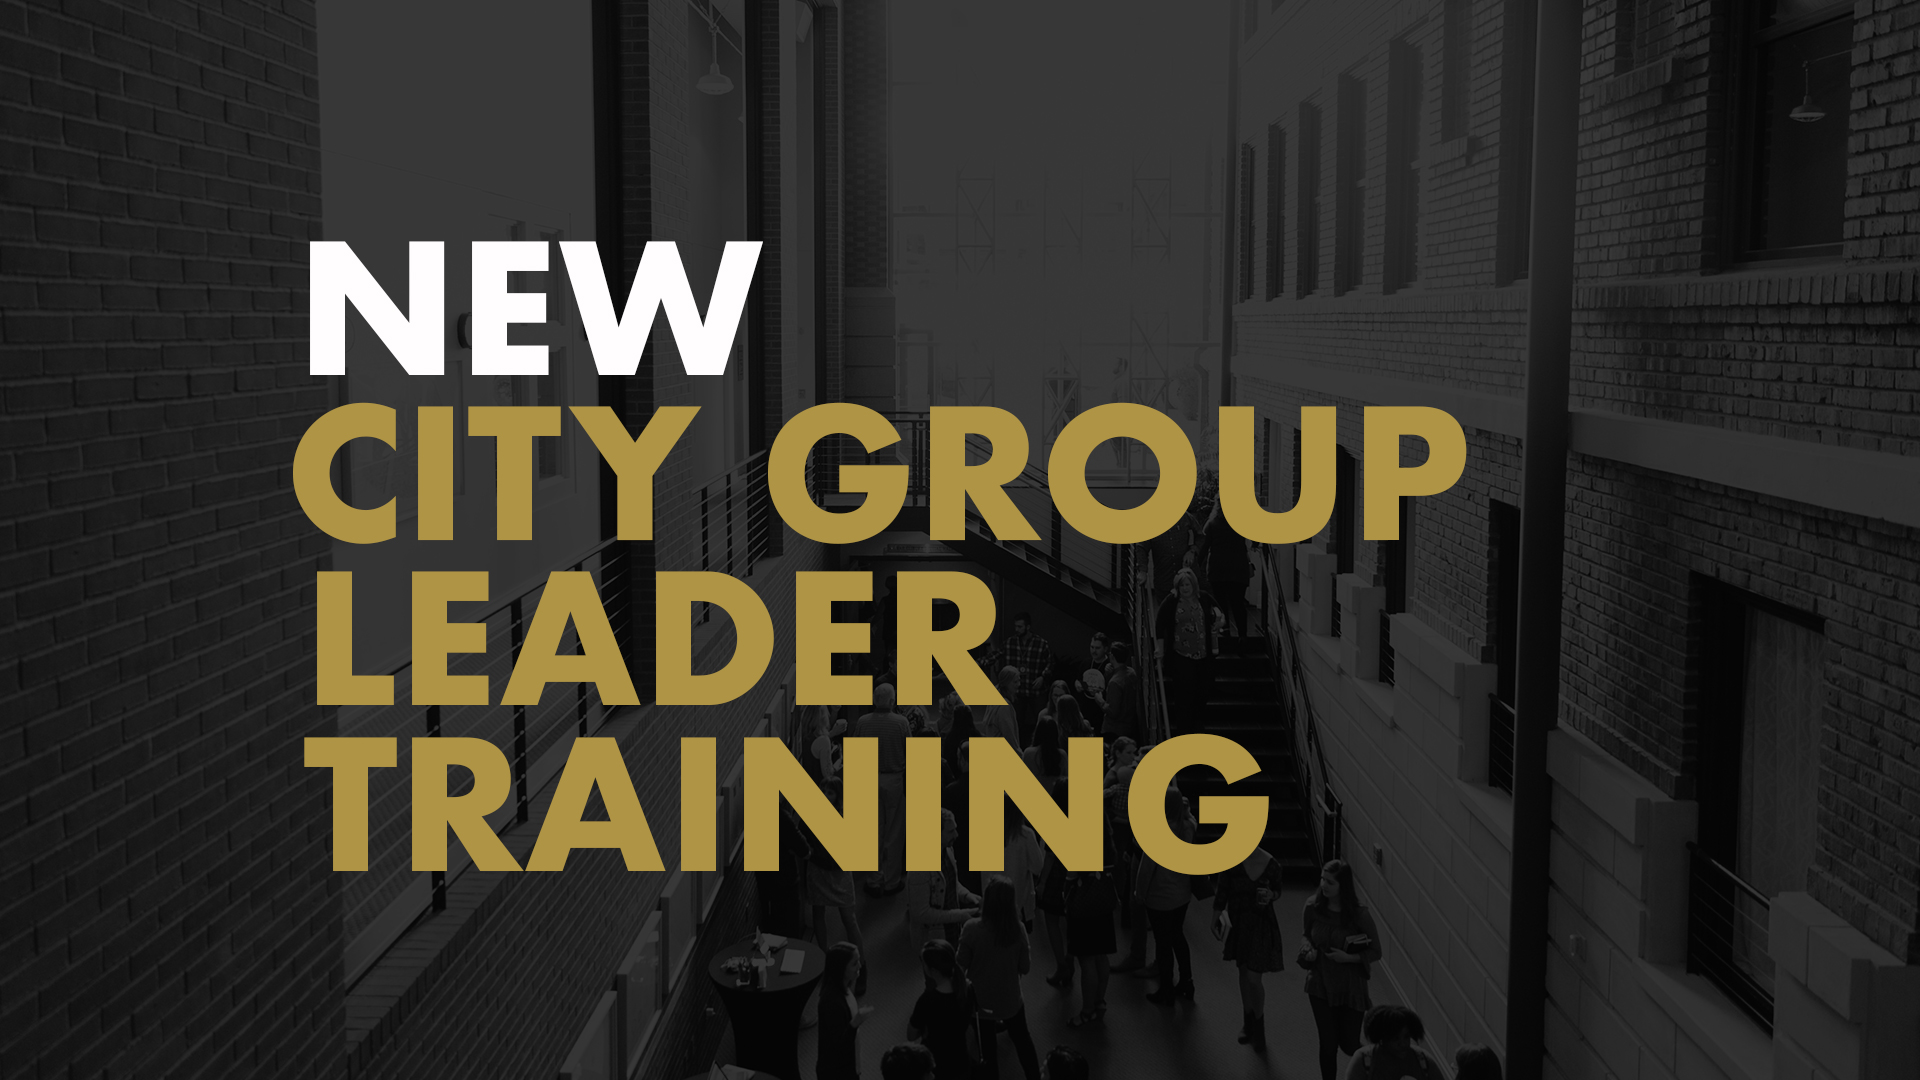 Cg leader training